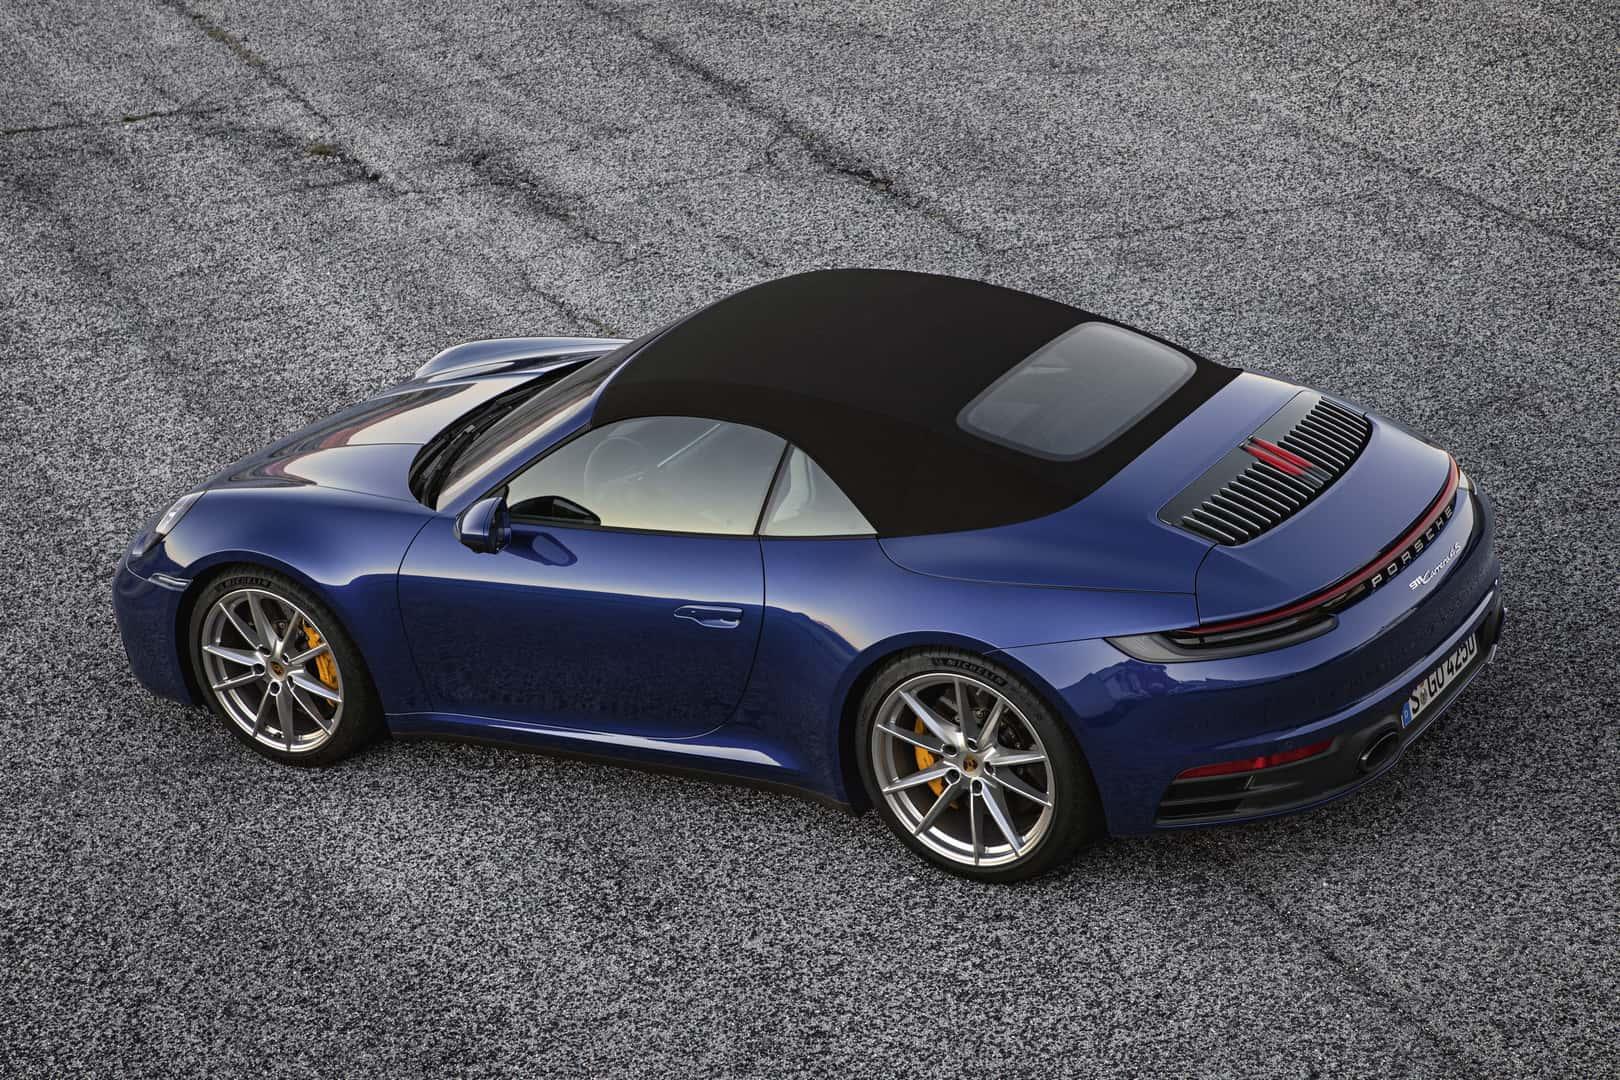 Porsche-911-Cabriolet-10